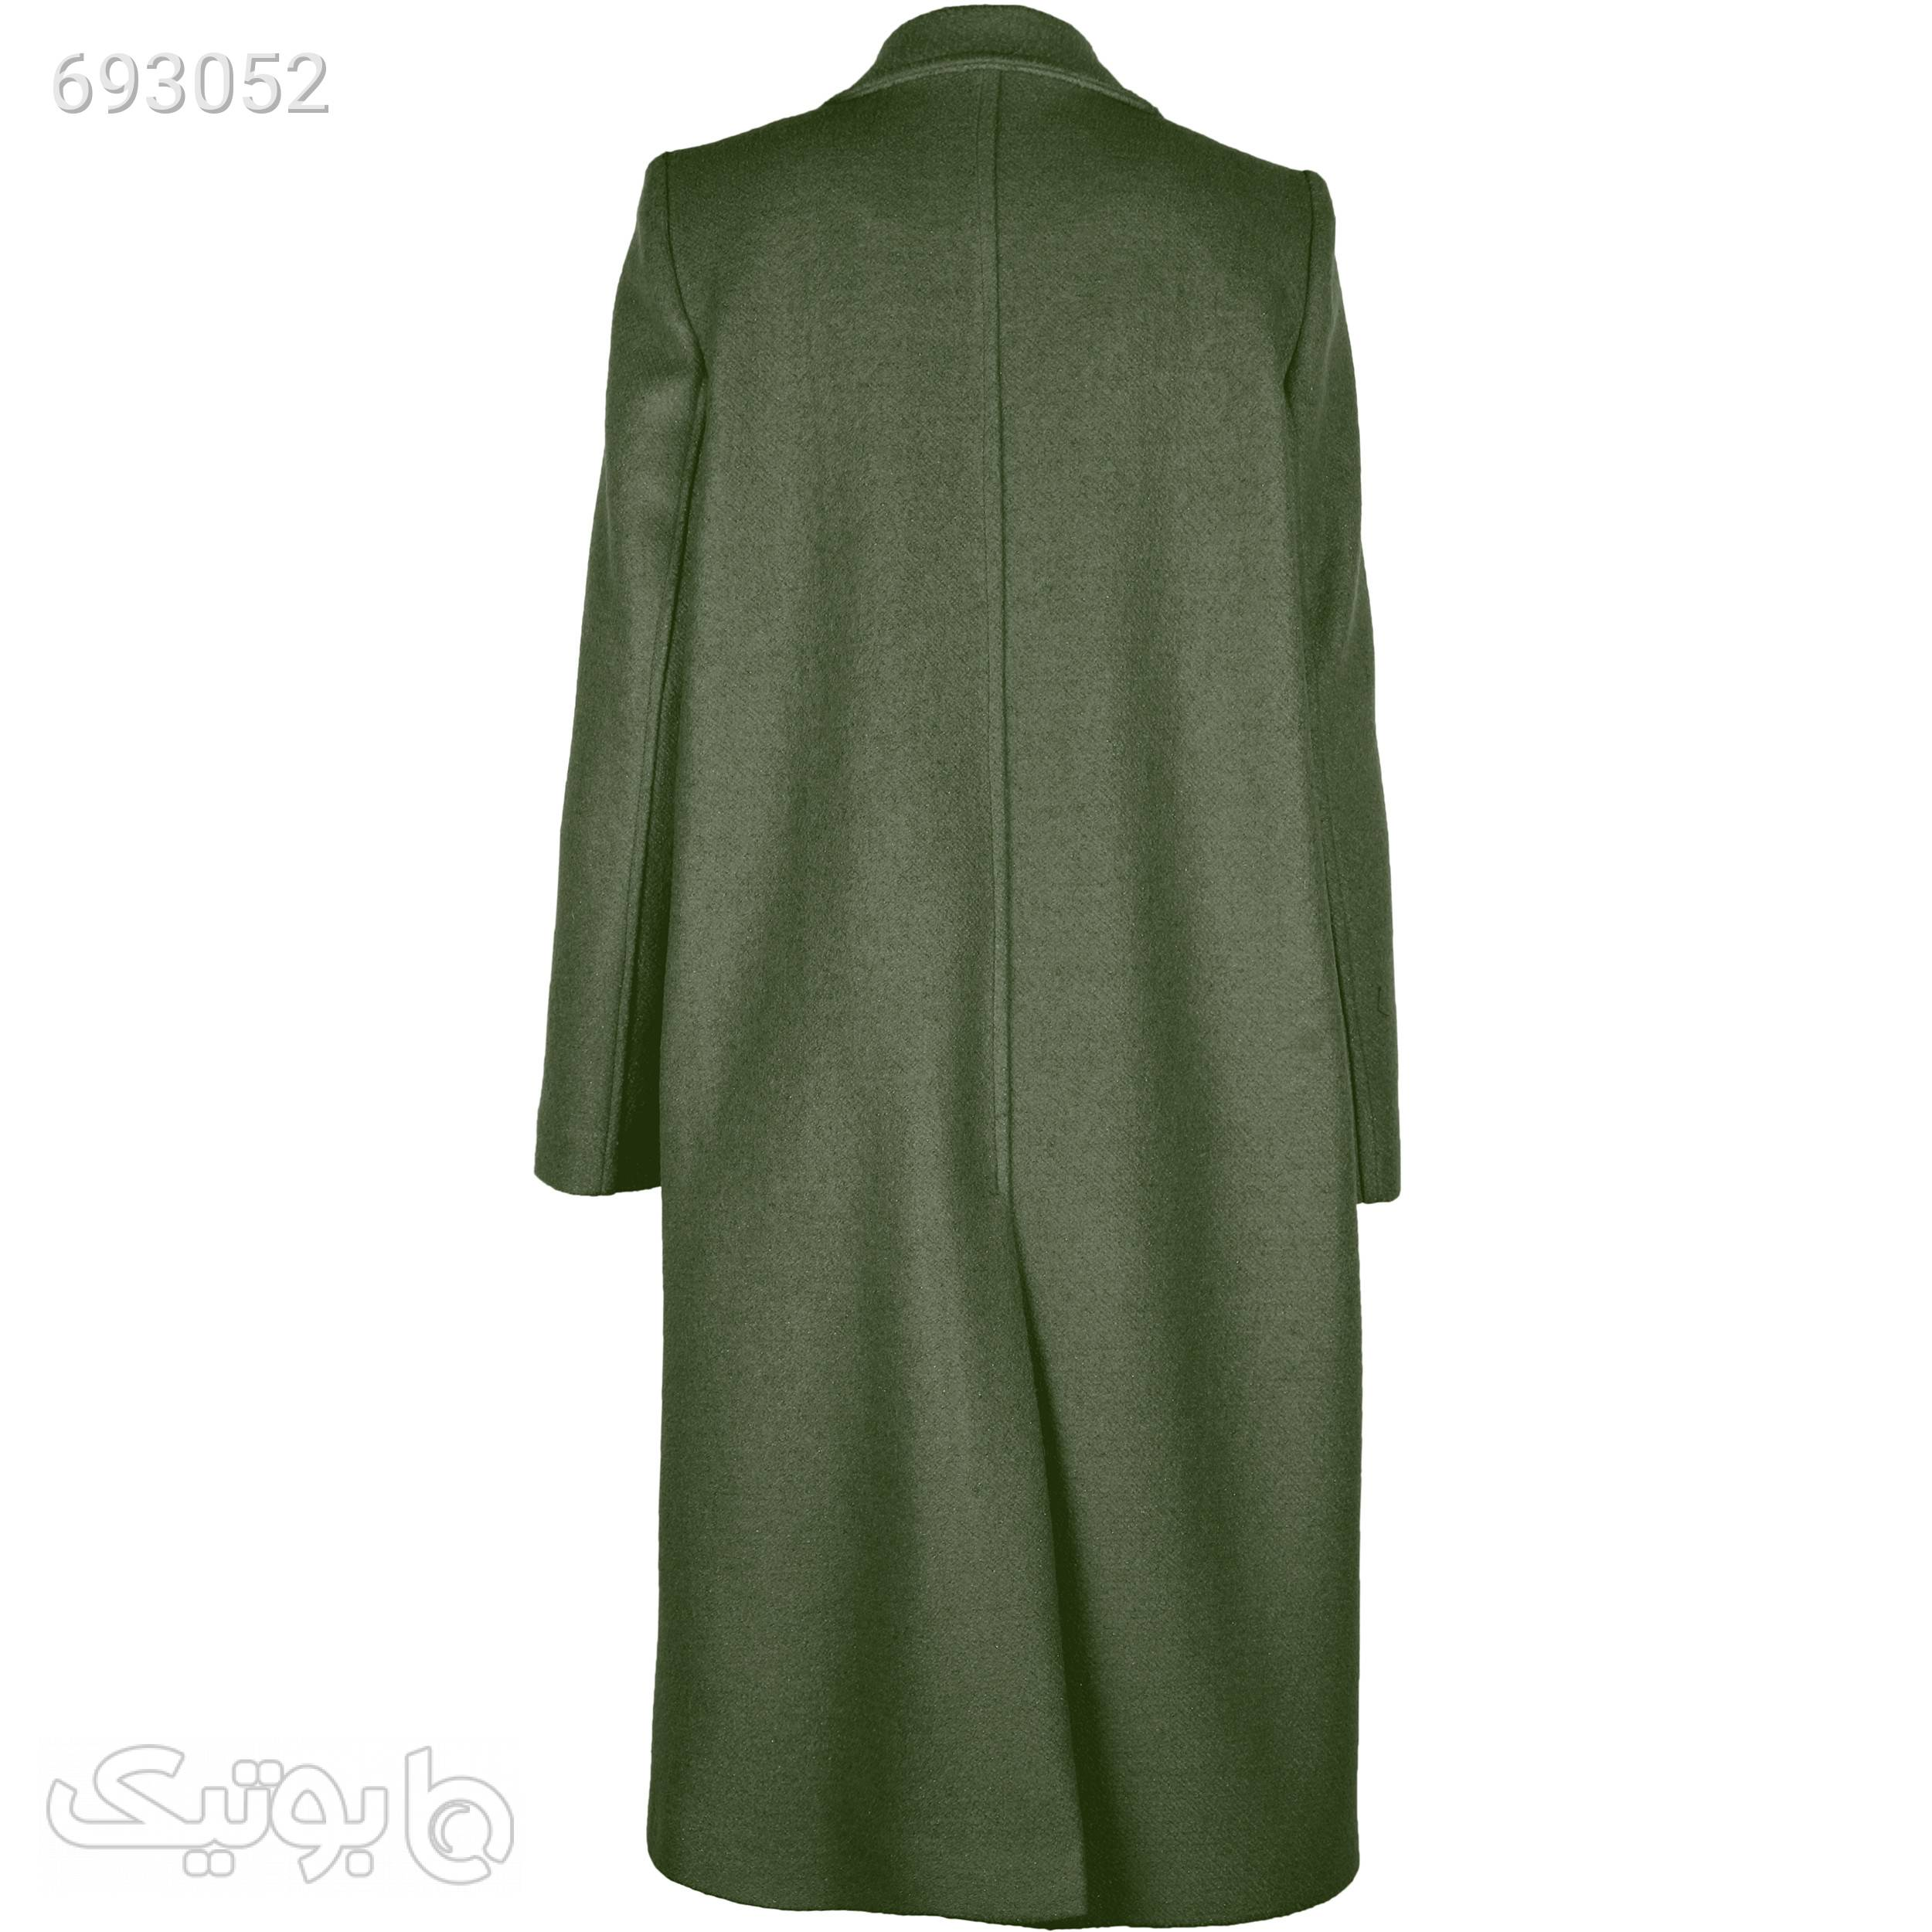 پالتو زنانه زیبو مدل ایمی کد 01716 سبز پالتو زنانه